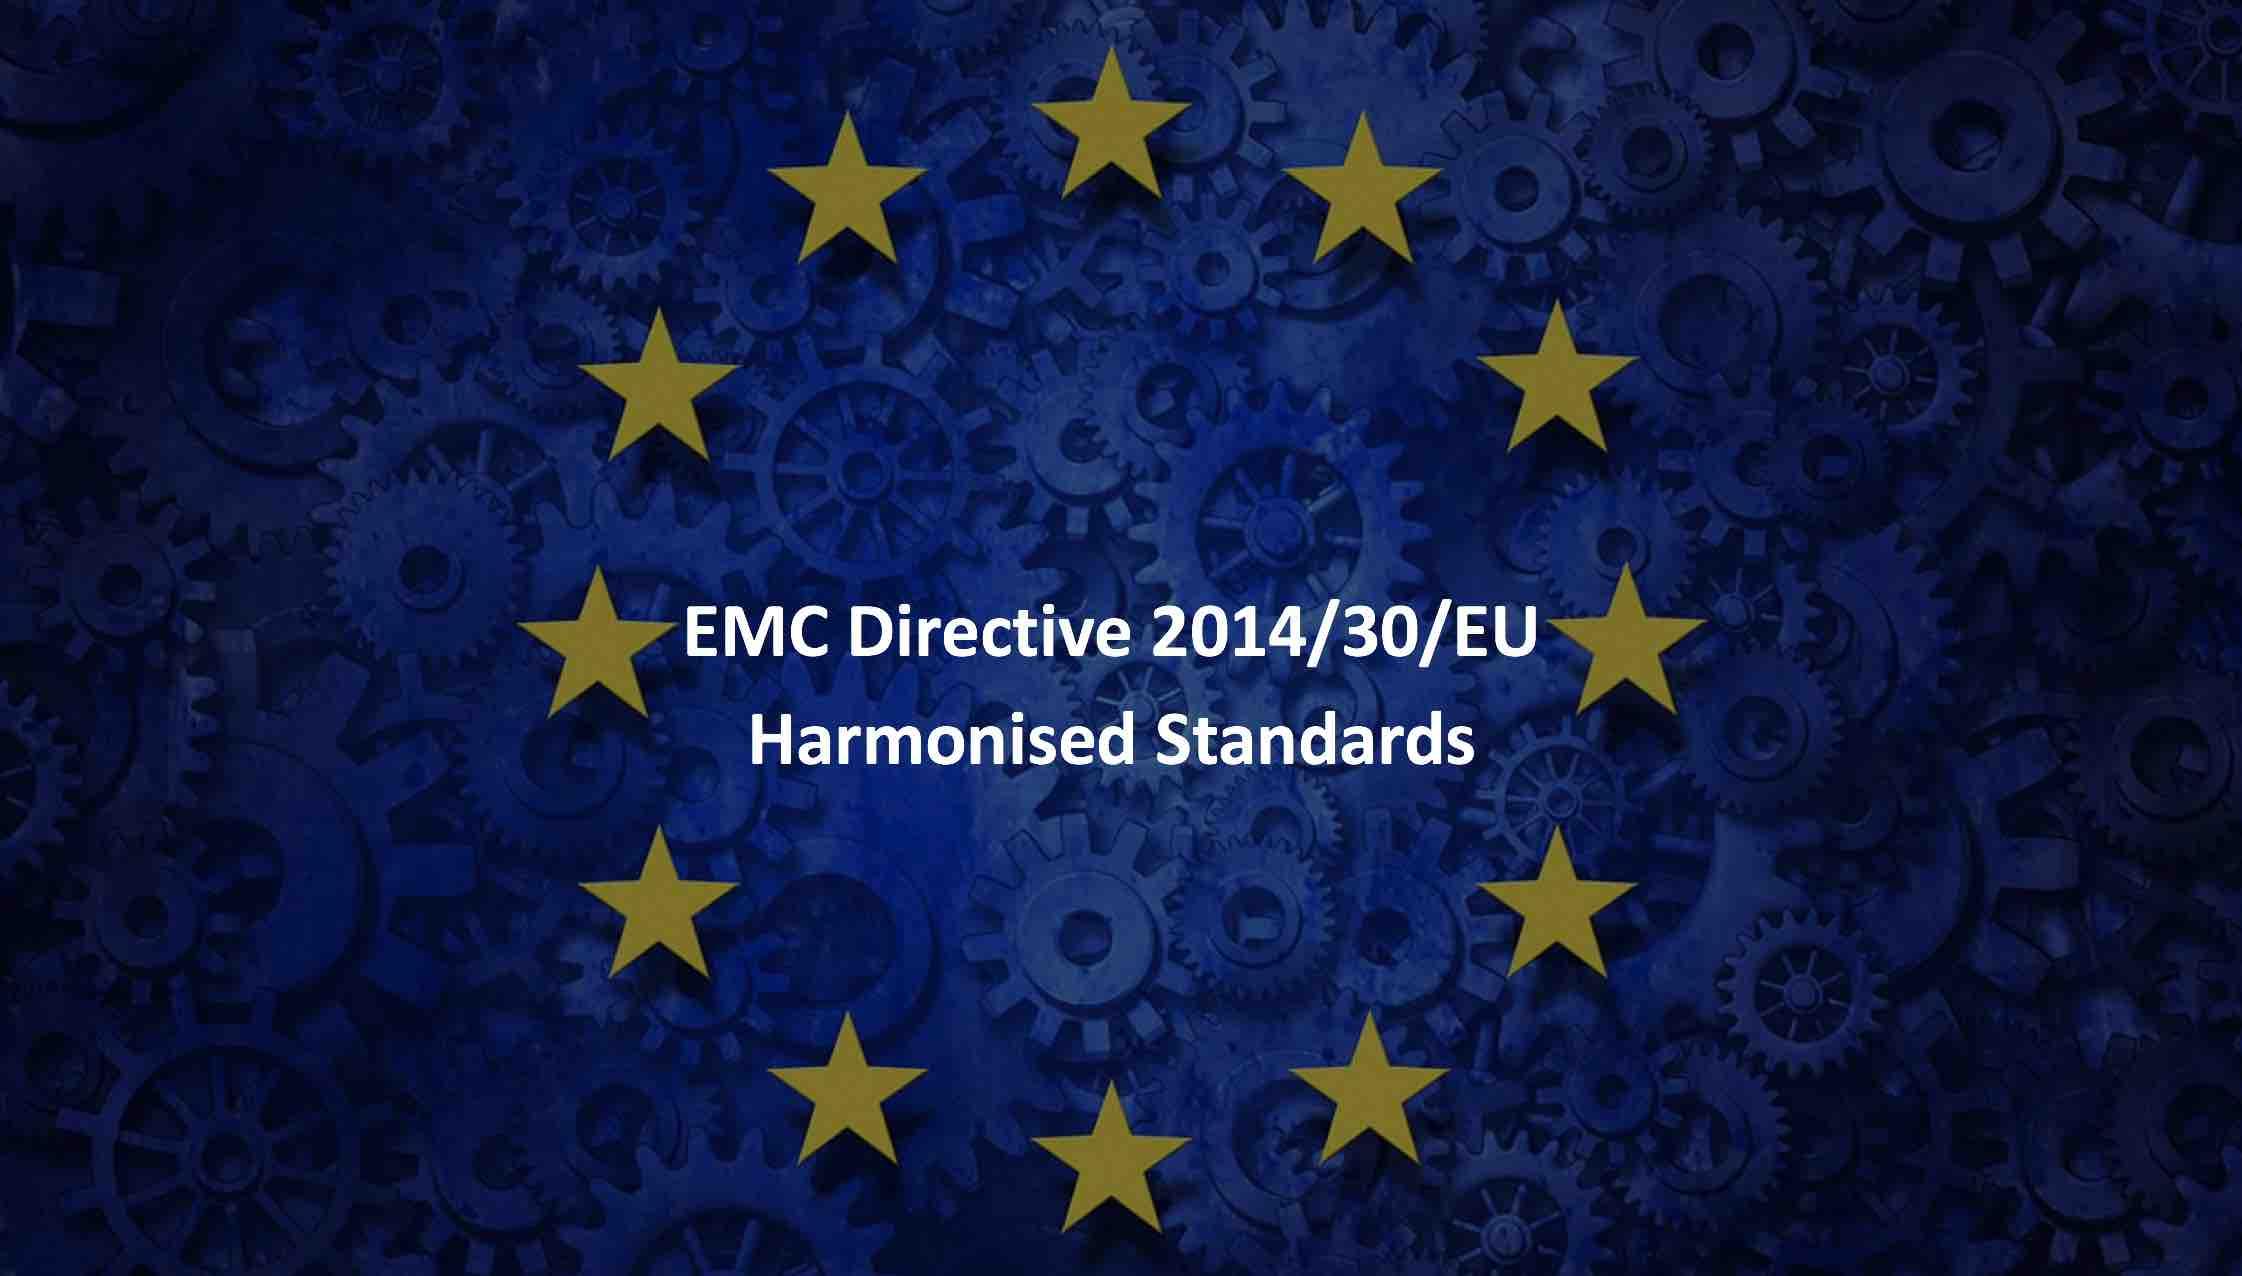 EMC testing standards